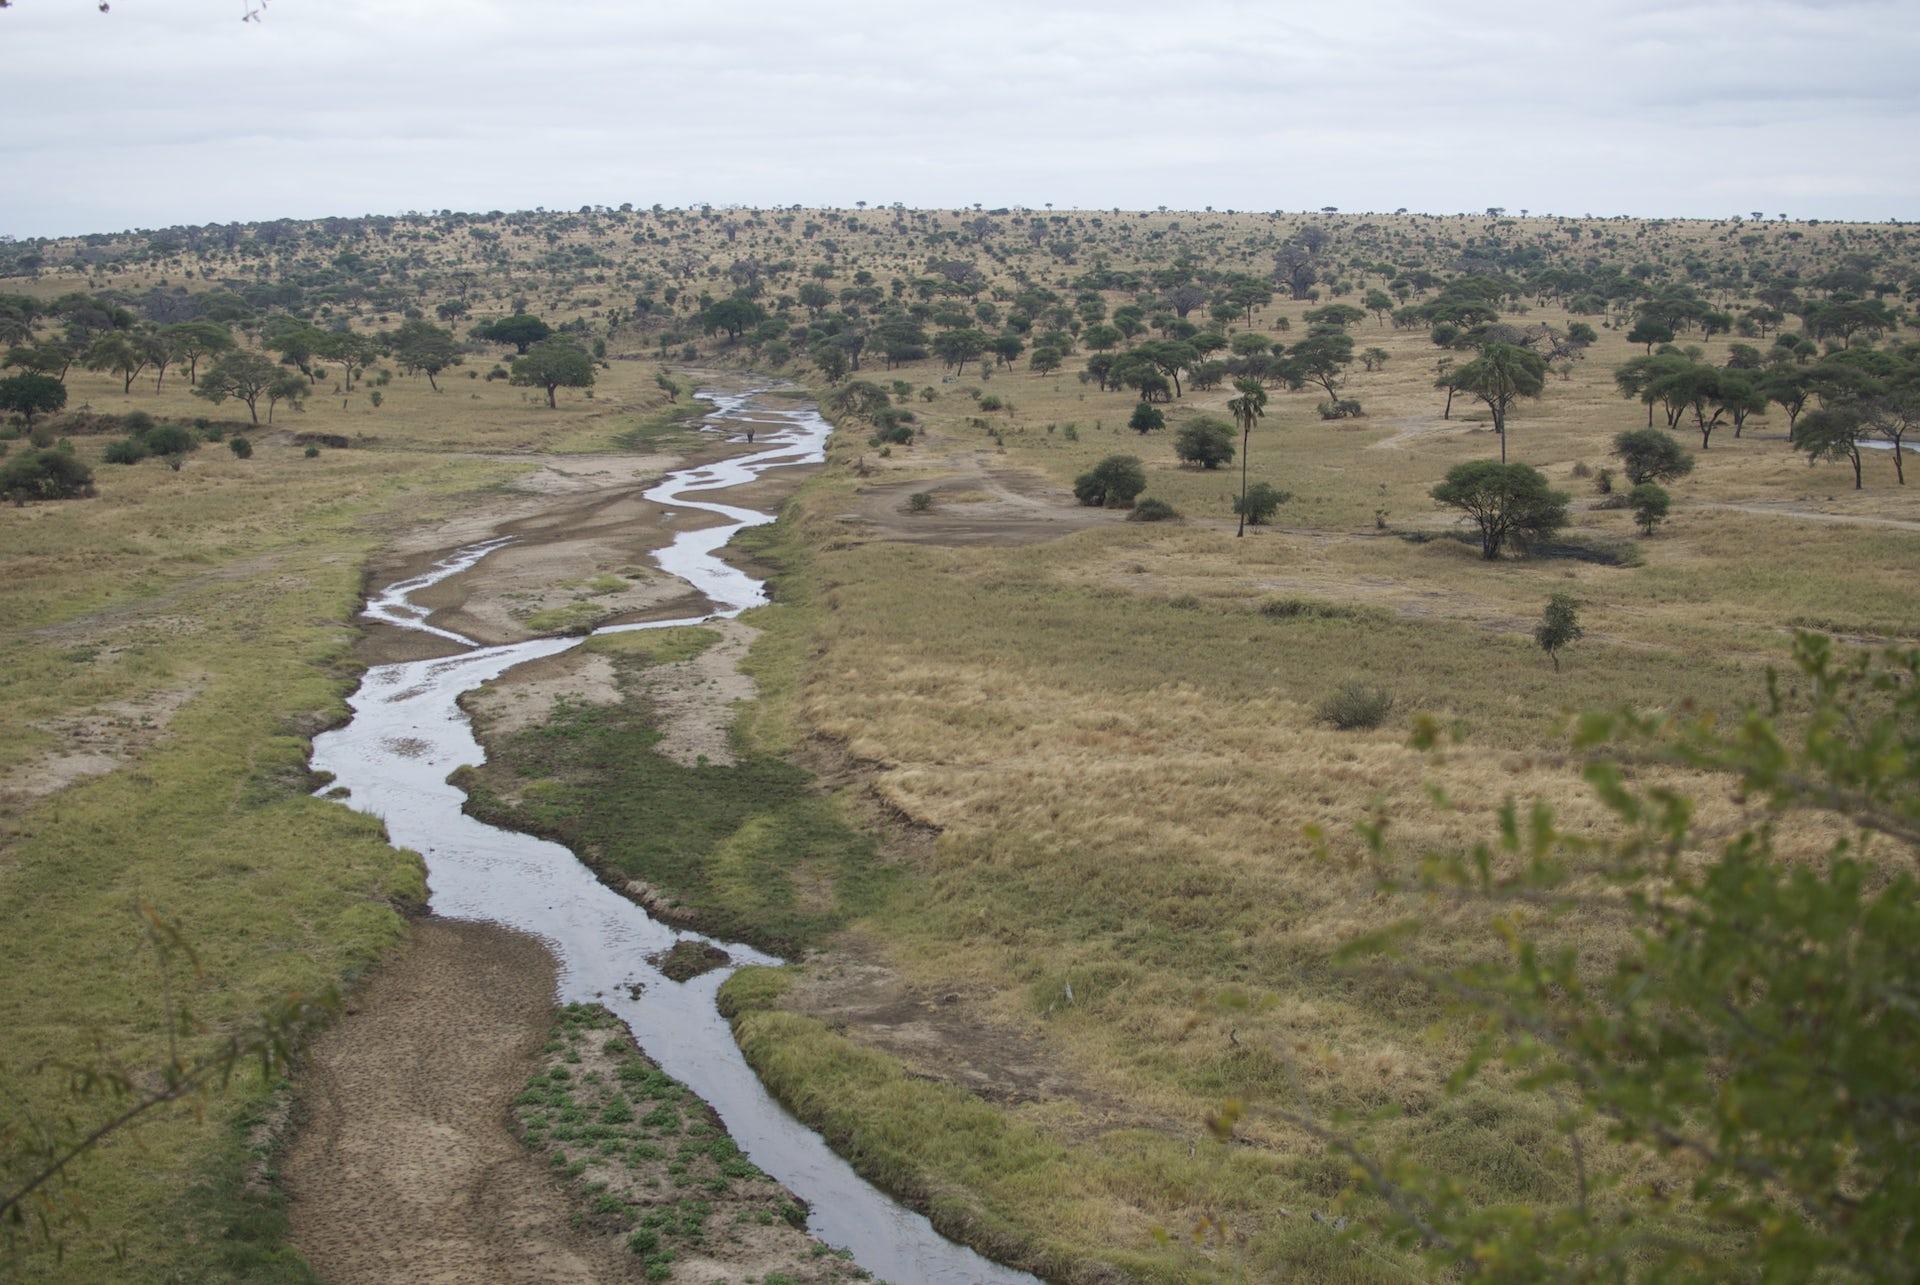 file 20170613 25868 1mkw5lr.jpg?ixlib=rb 1.1 - On the savanna, mobile phones haven't transformed Maasai lives – yet